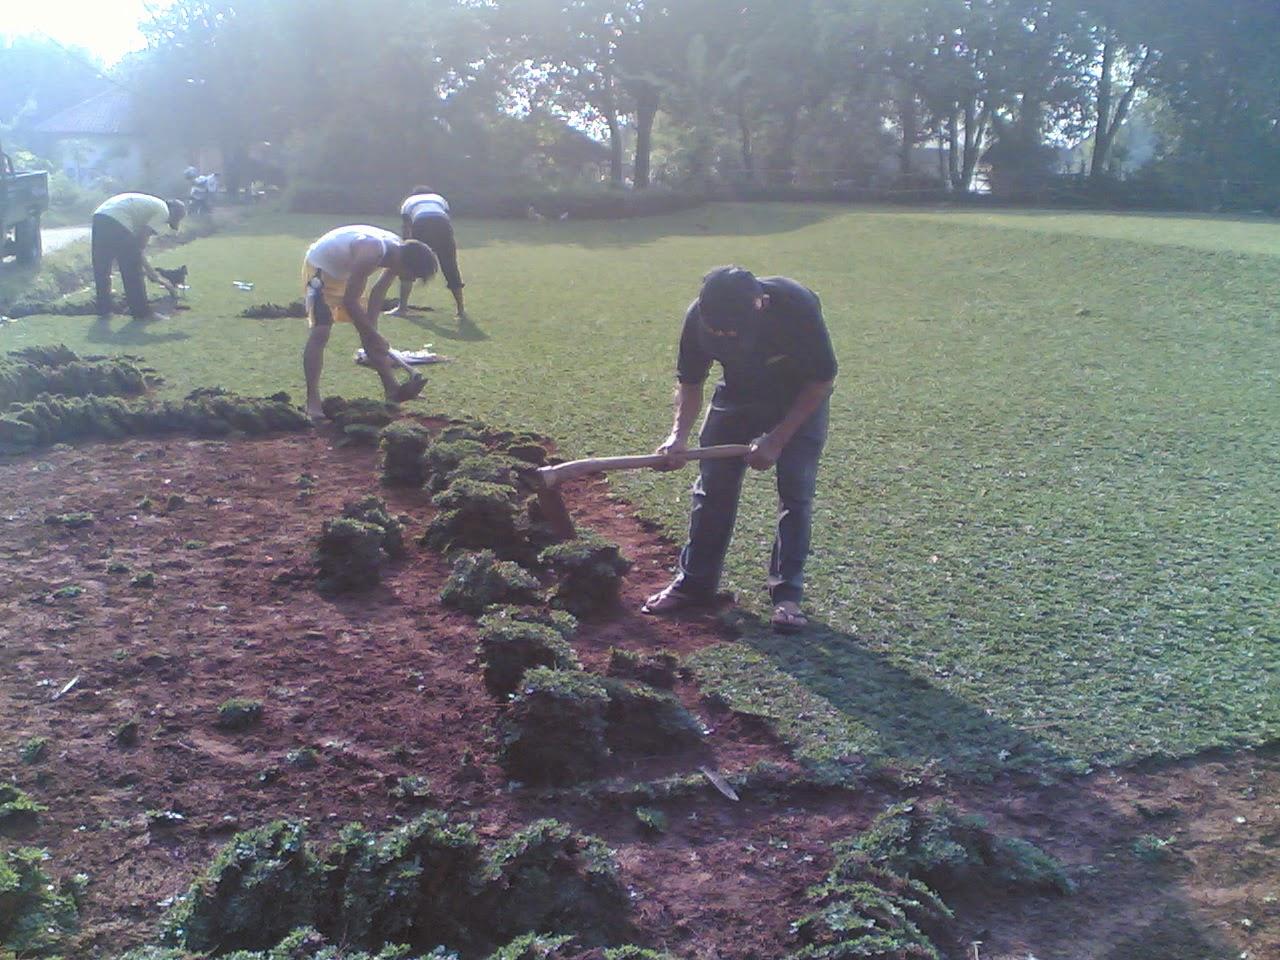 Tukang taman rumput | Tukang taman minimalis | Dekorasi taman | Saung gazebo